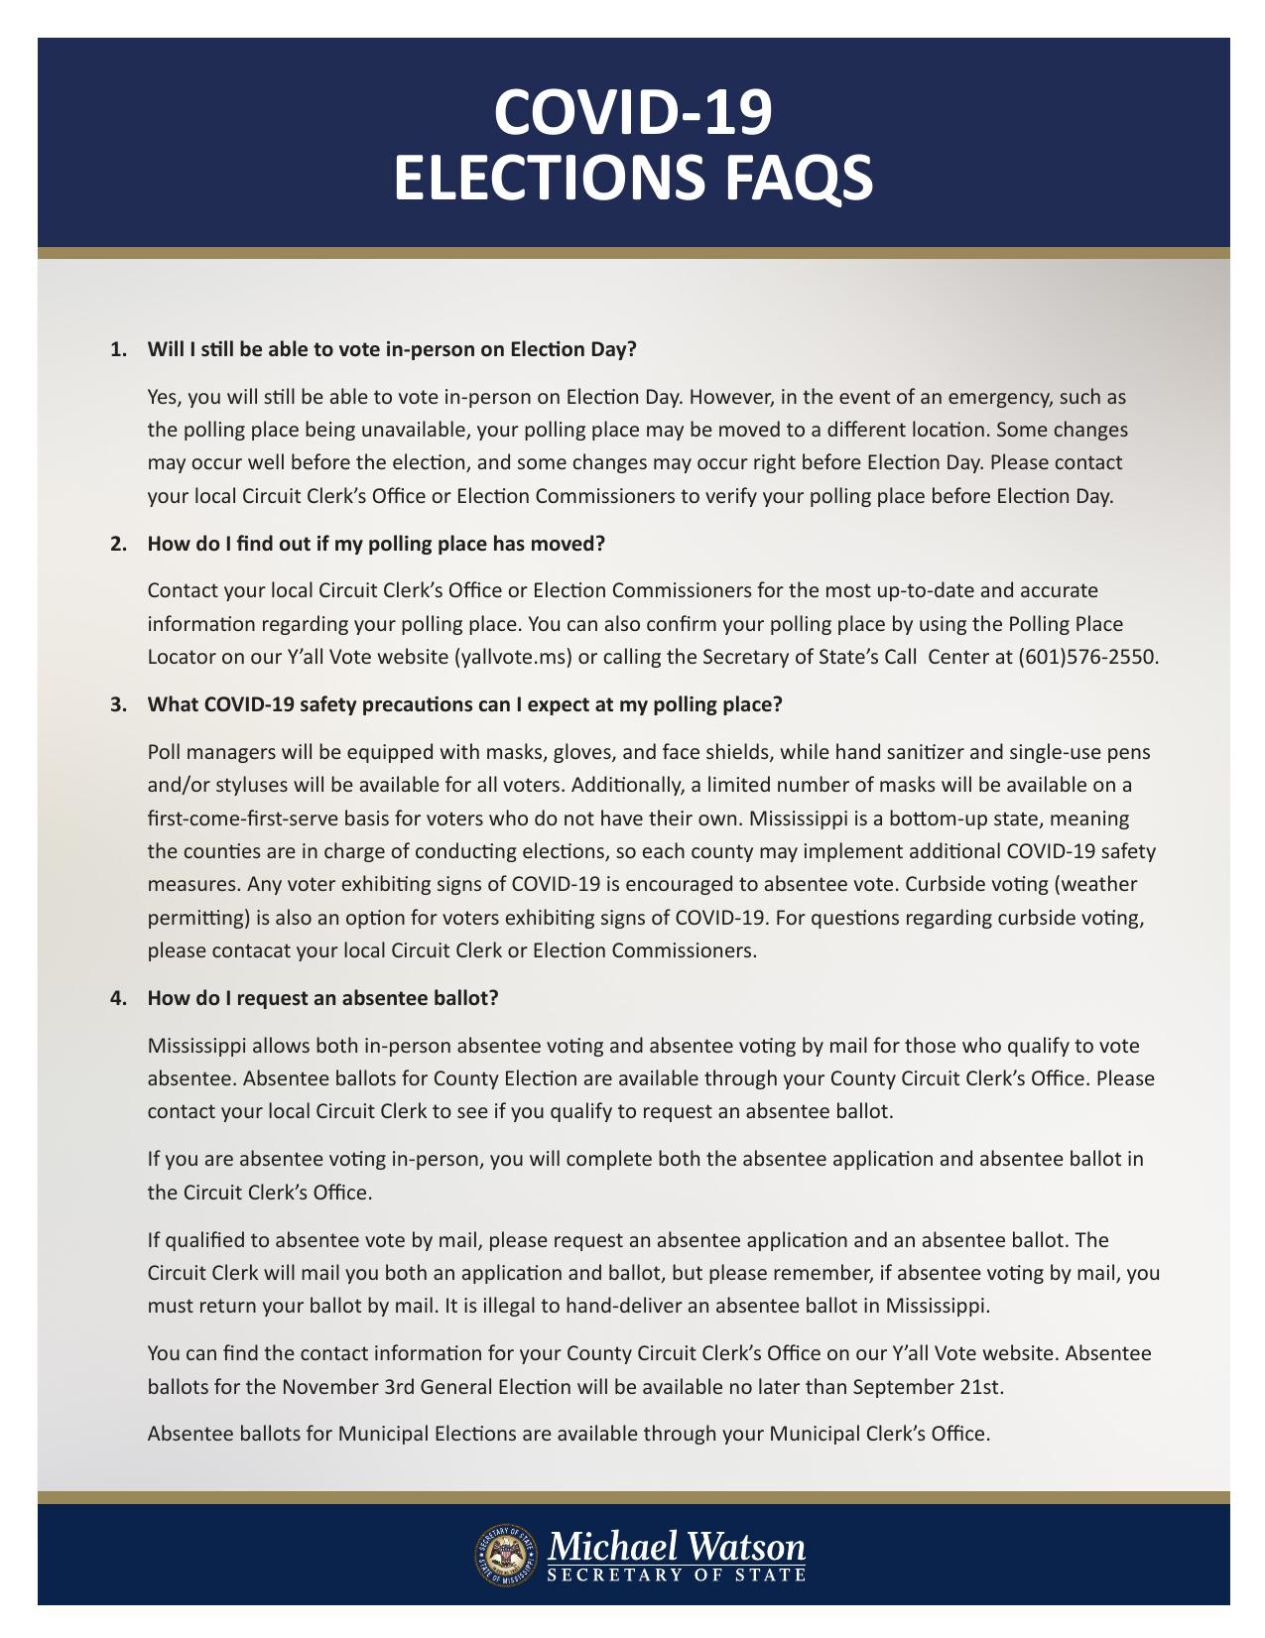 COVID-19 Election FAQs